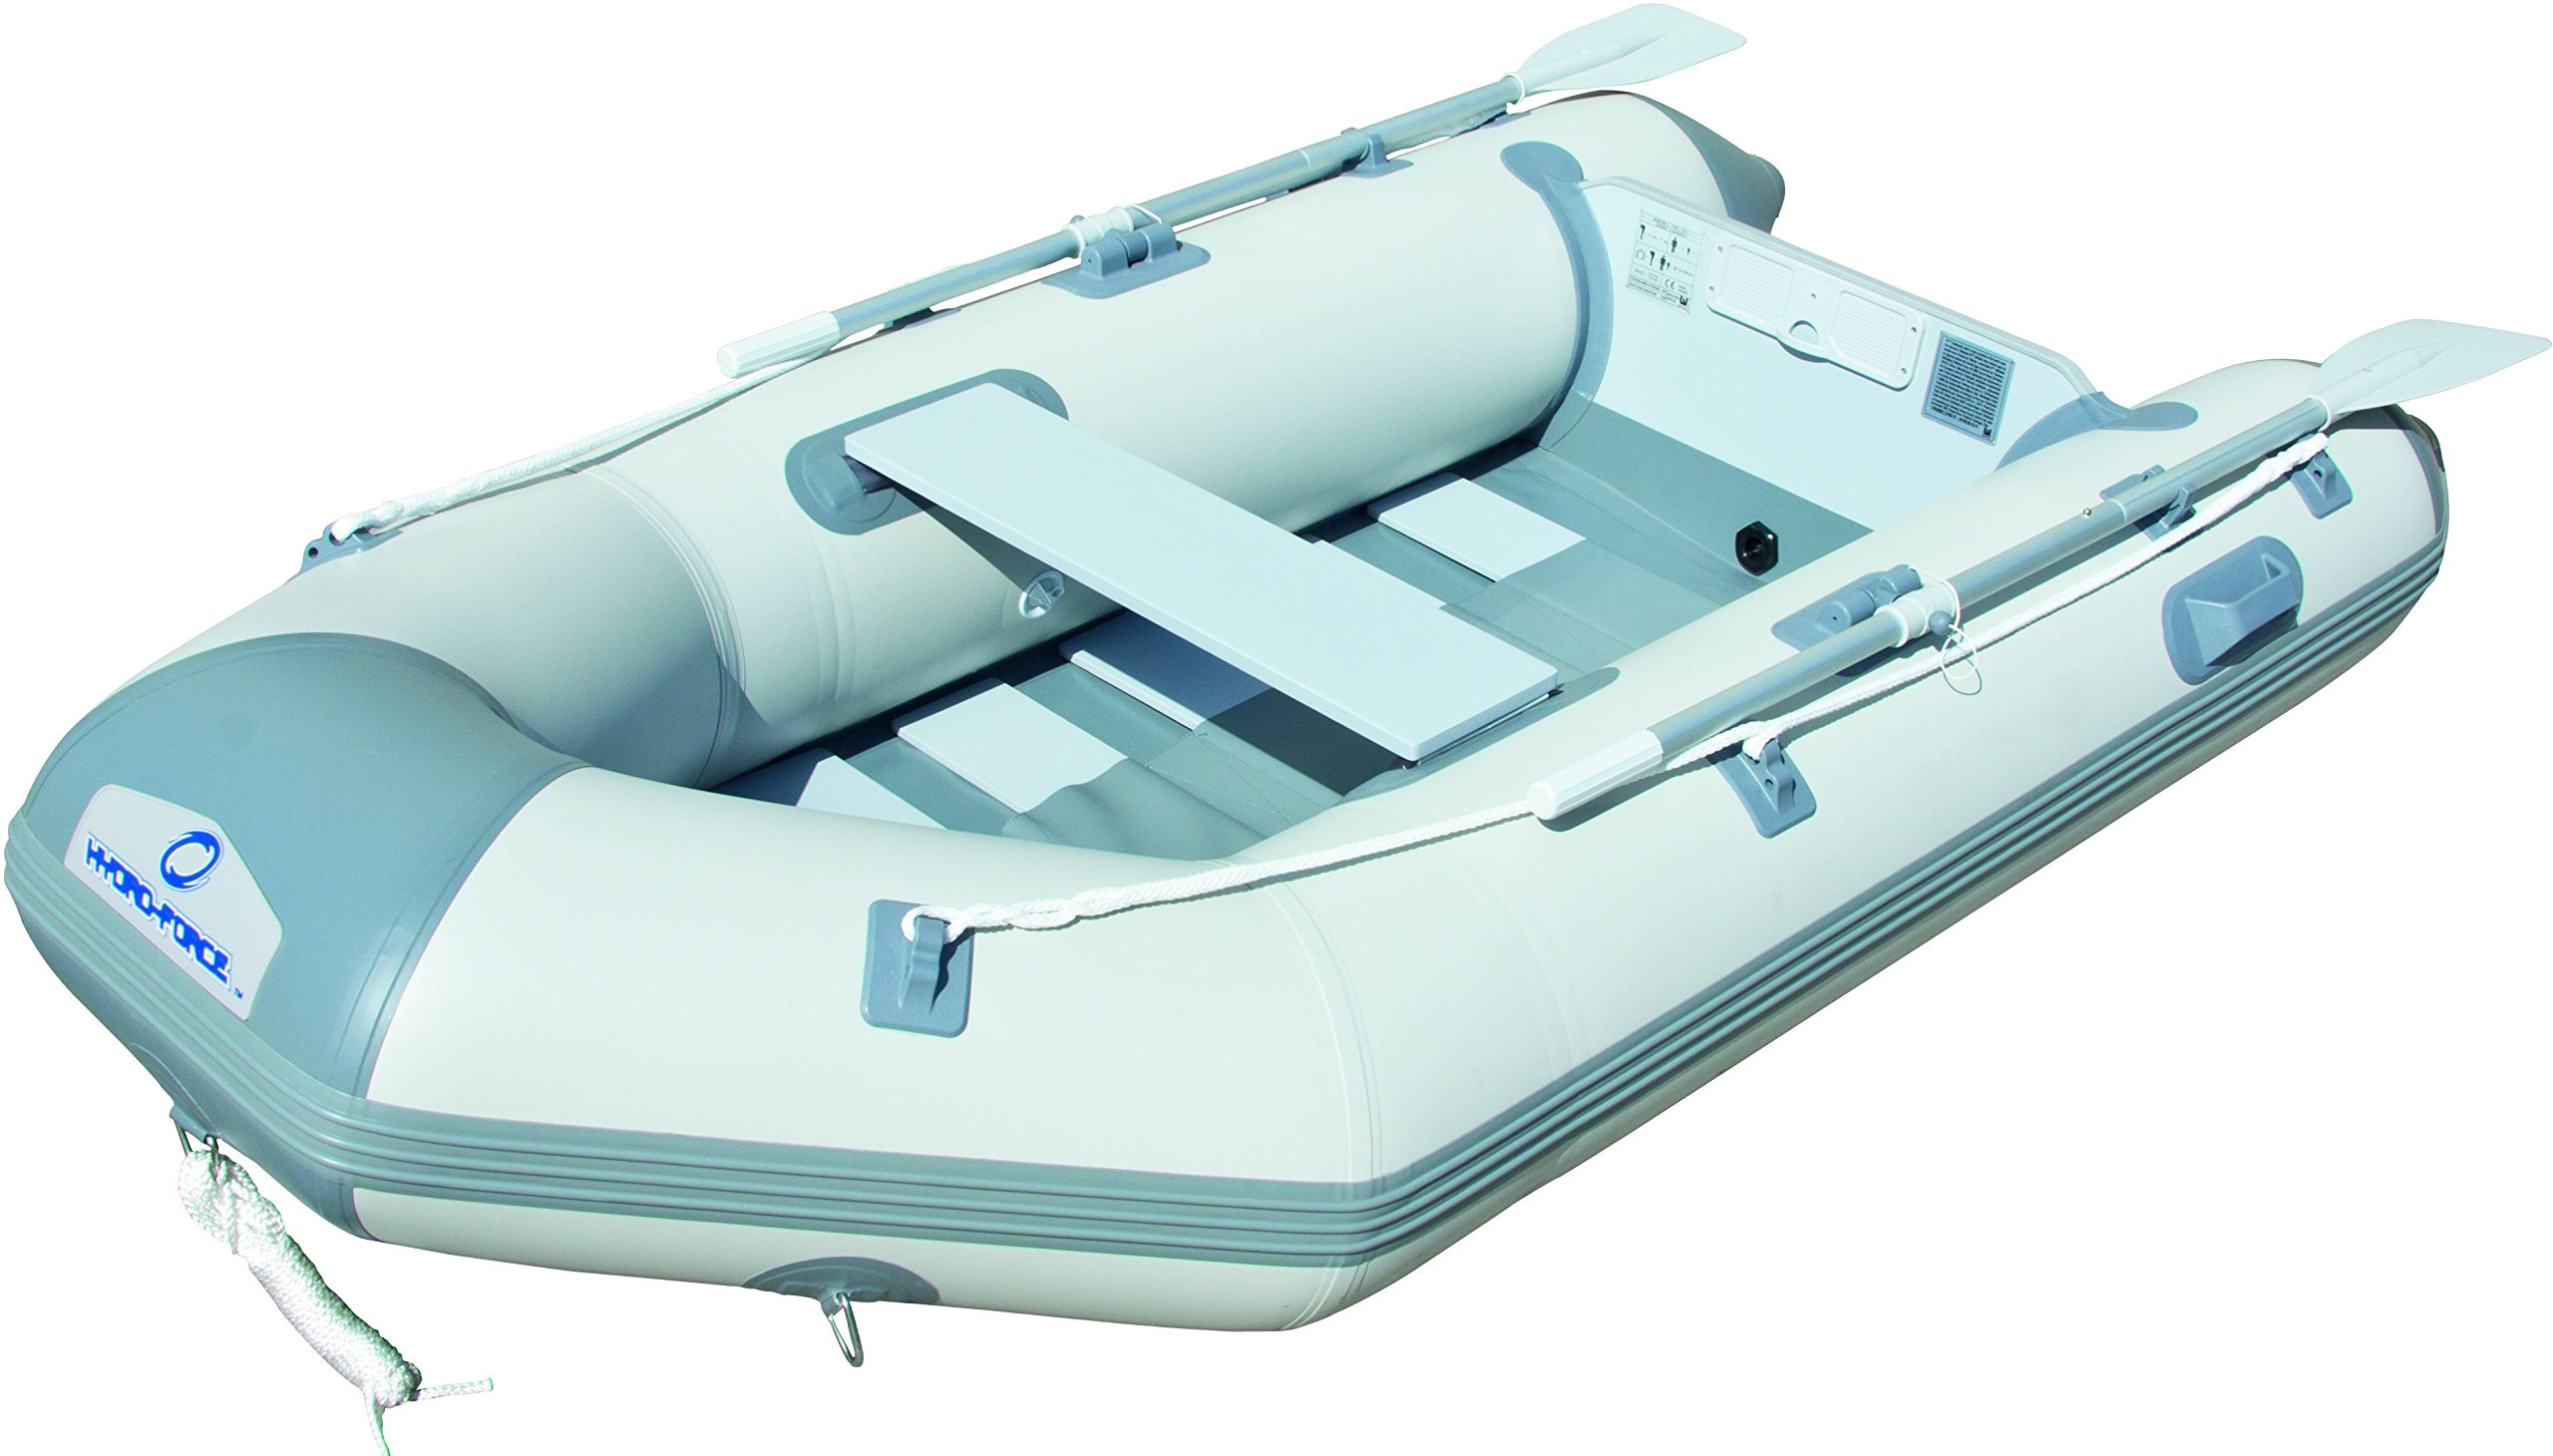 Hydro-Force Nav Rapids 2.7m RIB Inflatable Boat